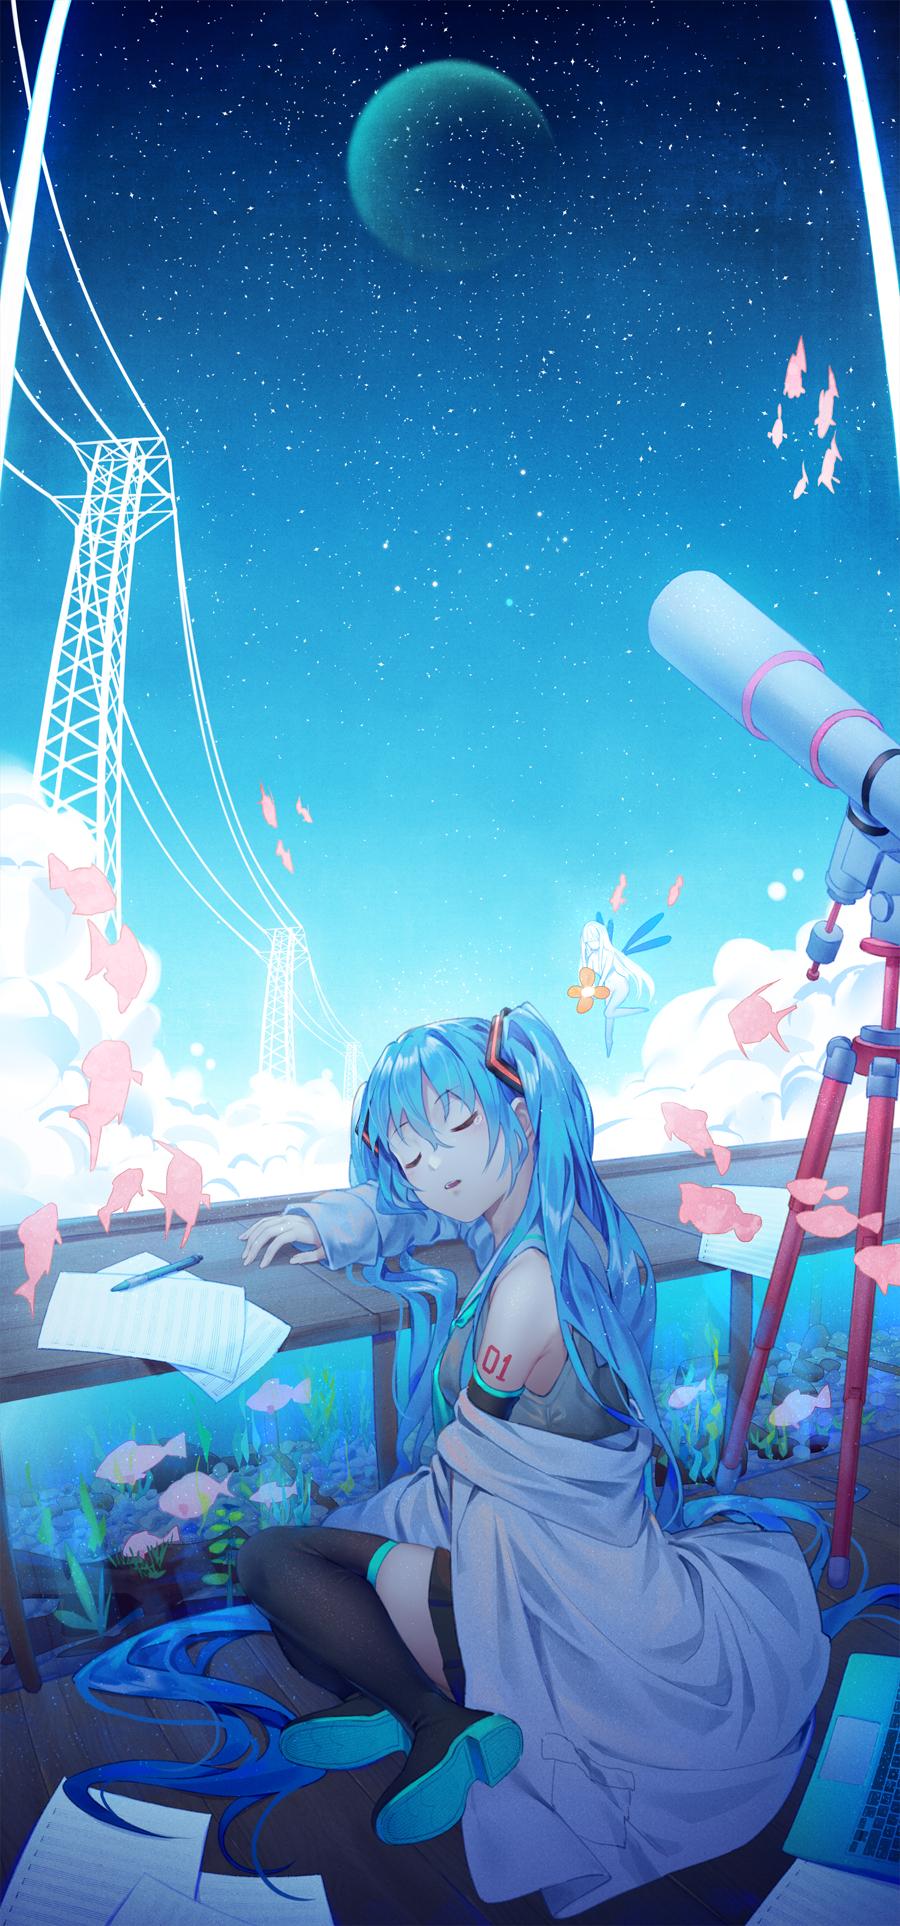 Wallpaper Sedang Tidur Hatsune Miku Gadis Anime 900x1926 Editjoy 1813997 Hd Wallpapers Wallhere